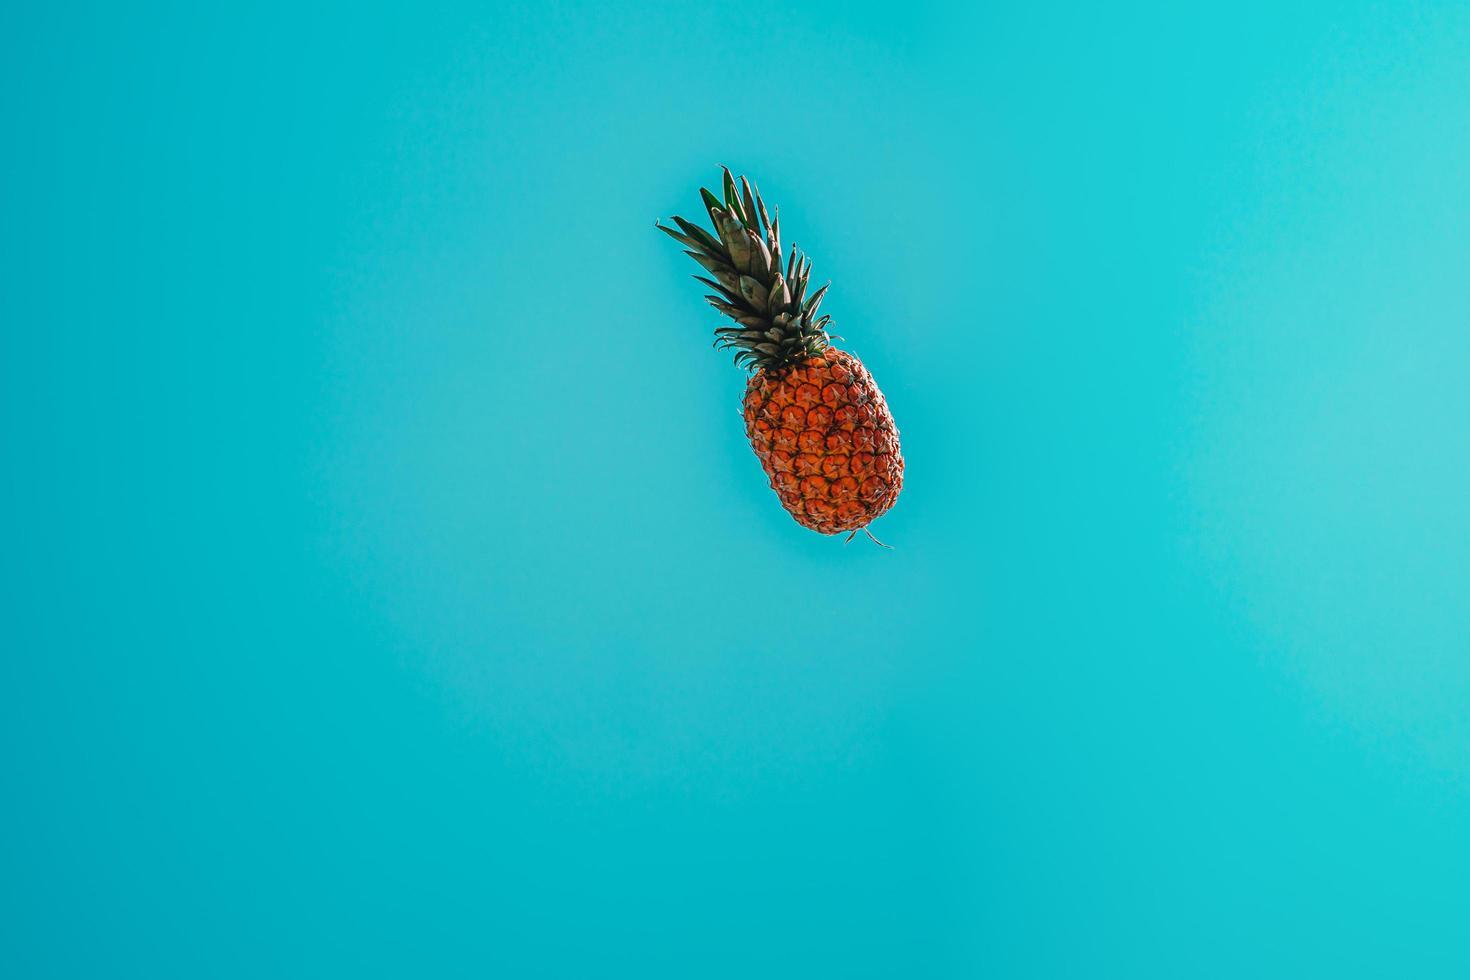 ananas vliegen in de lucht foto